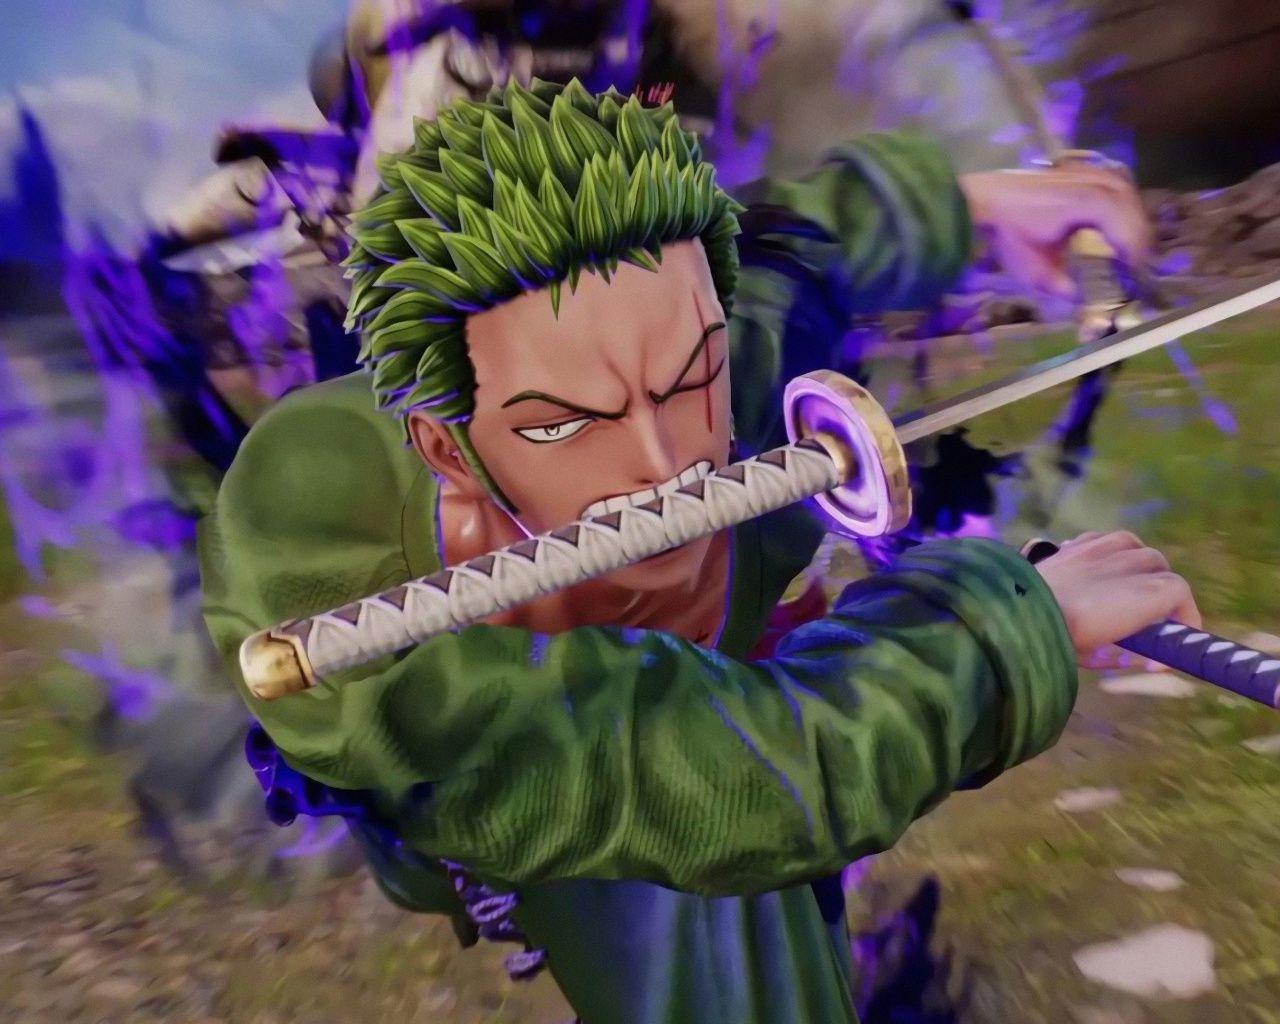 Download 1280x1024 Wallpaper Jump Force Roronoa Zoro Video Game One Piece Anime Standard 5 4 Fullscreen 1280x1024 Hd Image Roronoa Zoro Zoro Anime Smile